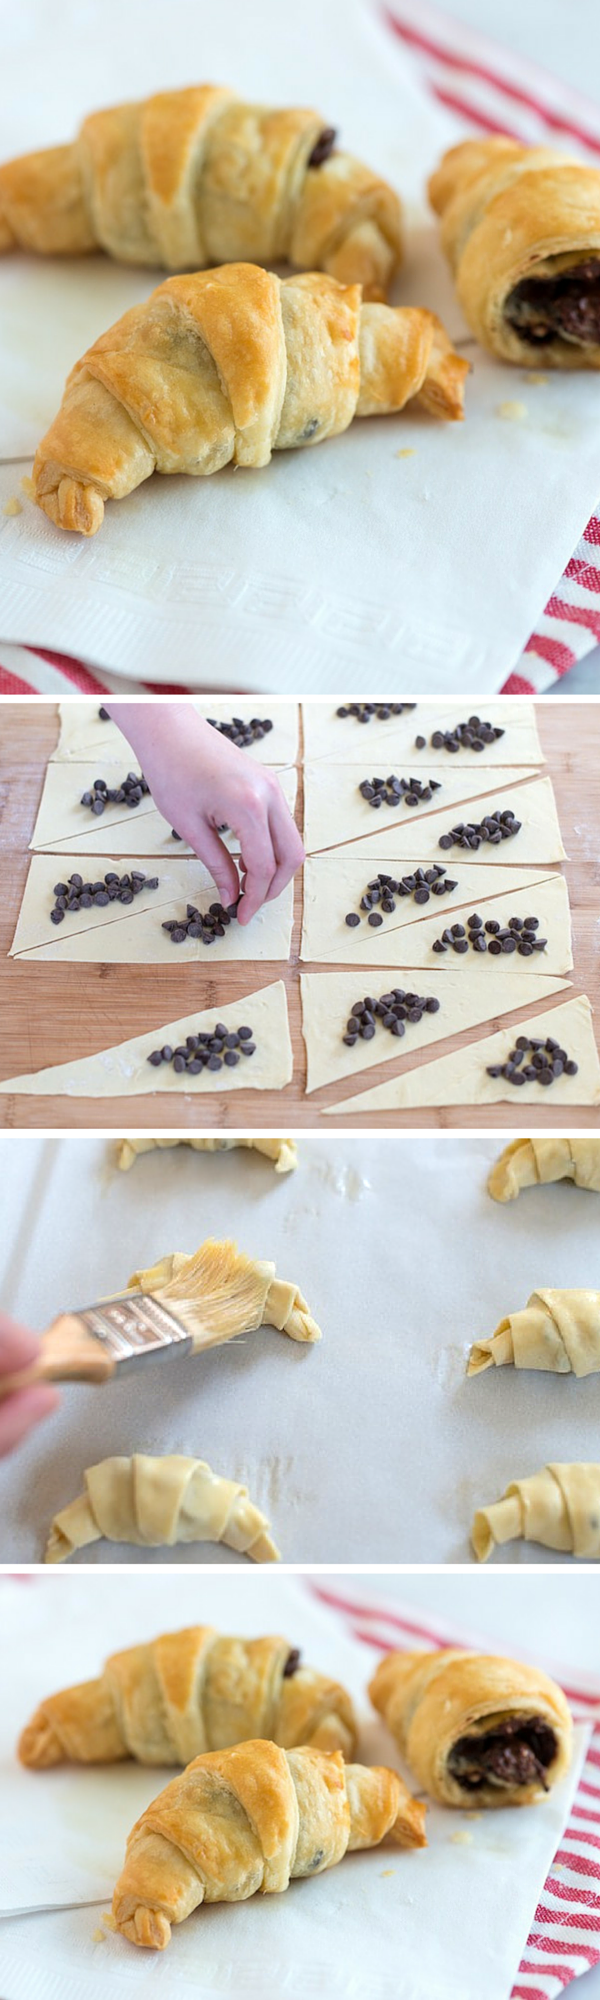 Easy, 30 Minute Chocolate Croissants | Recipe | Croissant ...